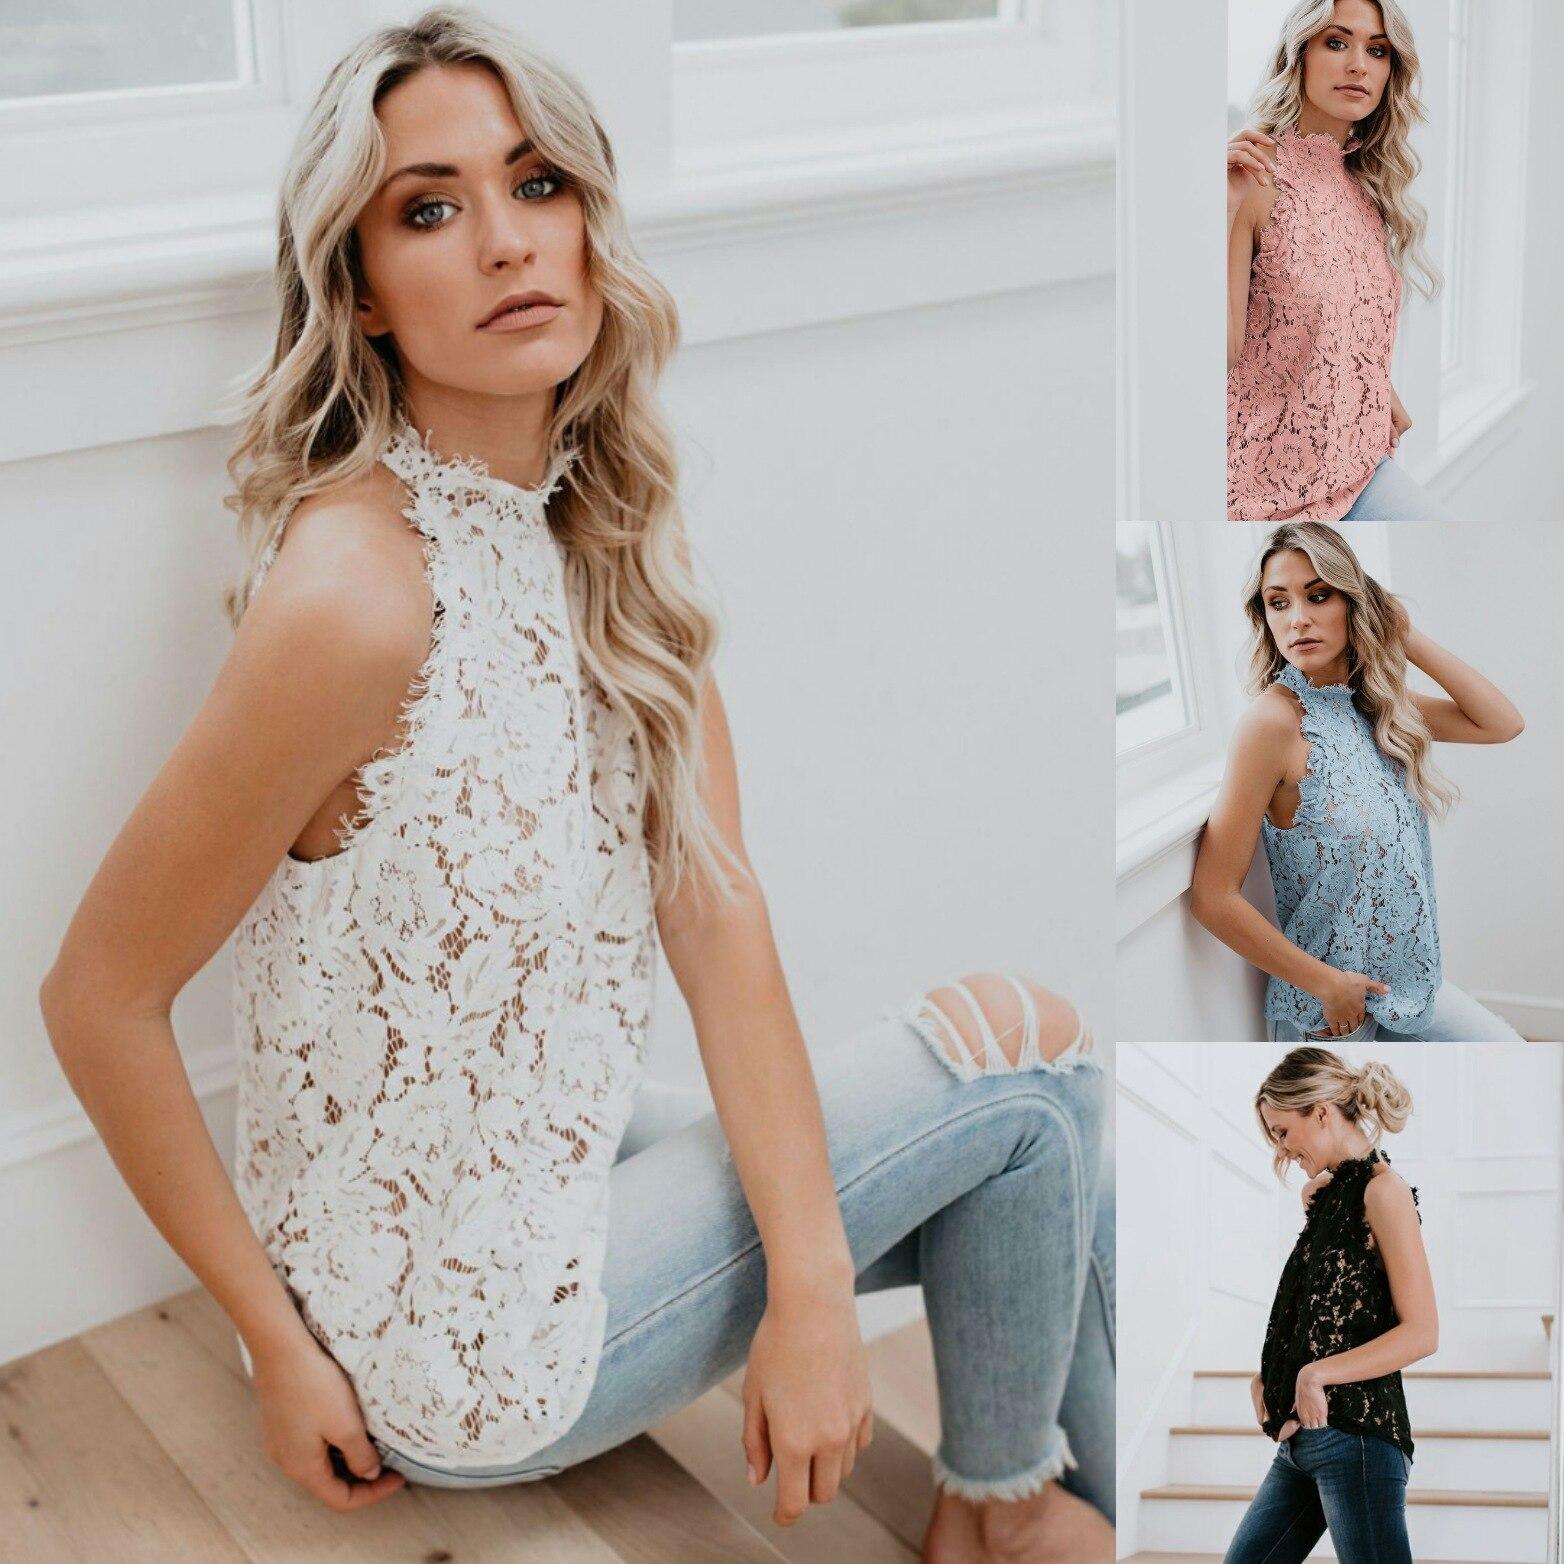 Plus Size Top Fashion Woman Blouses 2020 Sexy Hollow Out White Lace Halter Neck Sleeveless Shirts Blusas Femininas Party Clothes